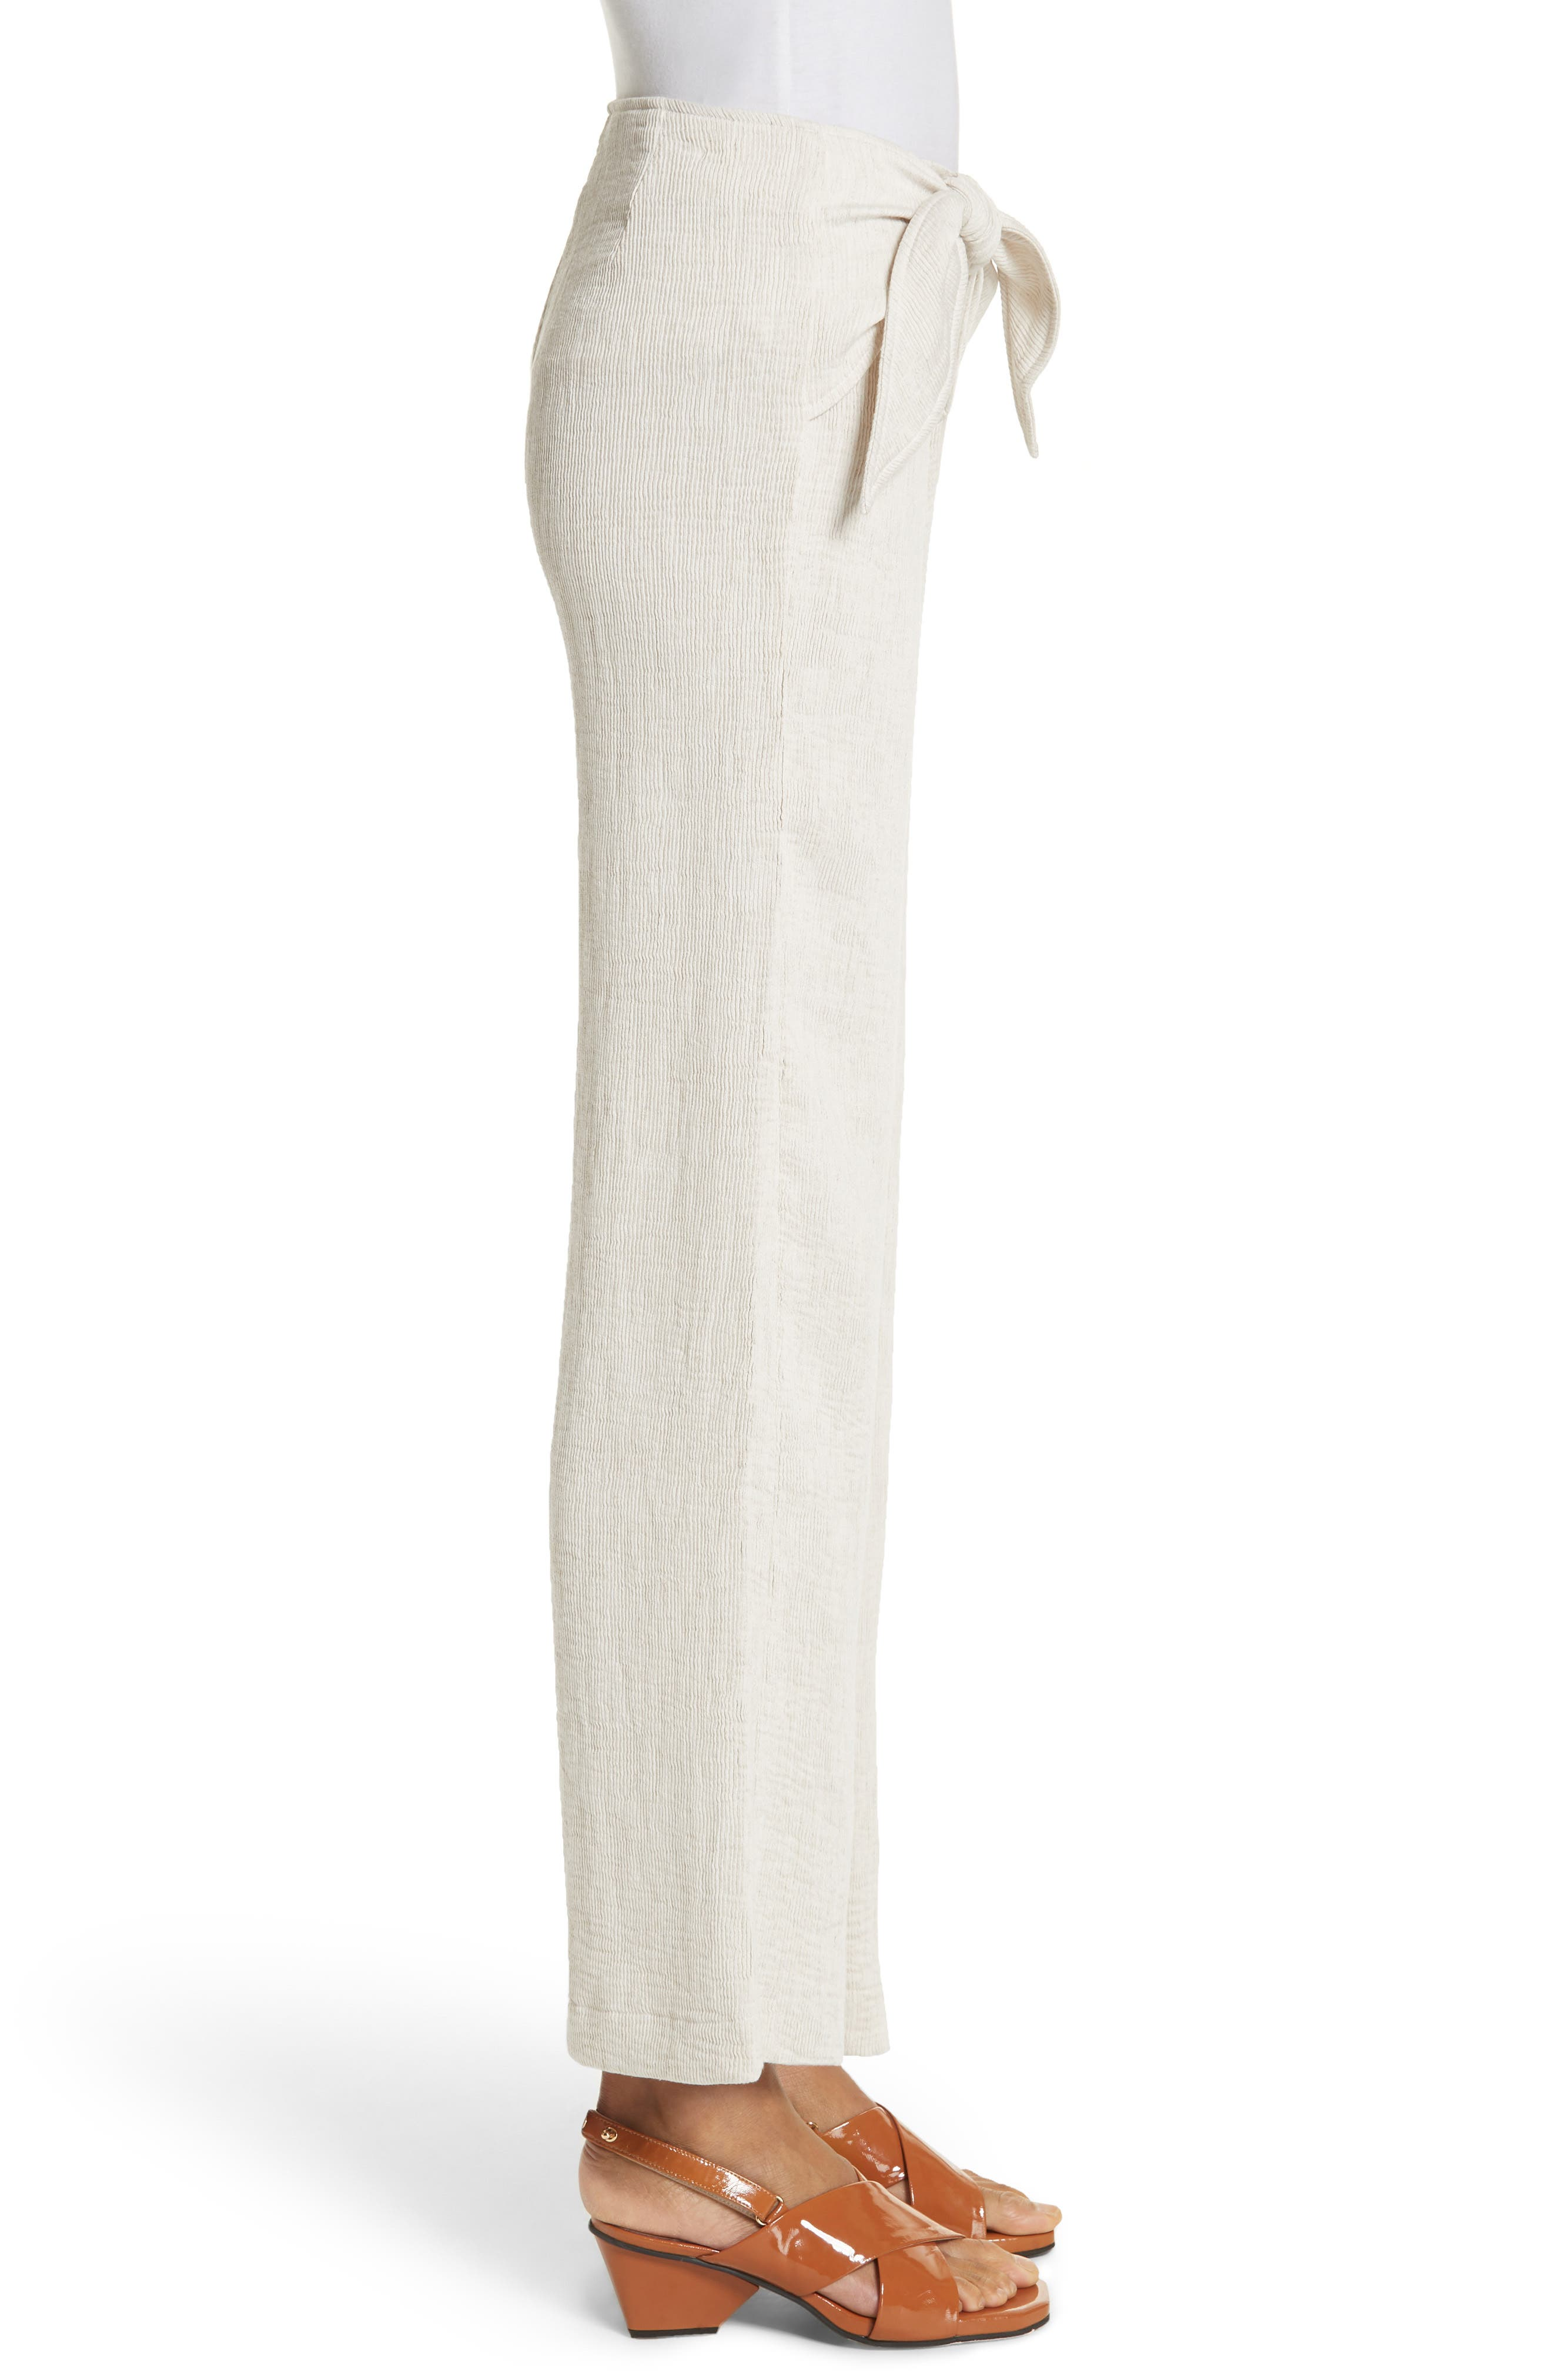 Hatton Drawstring Tie Front Pants,                             Alternate thumbnail 3, color,                             900